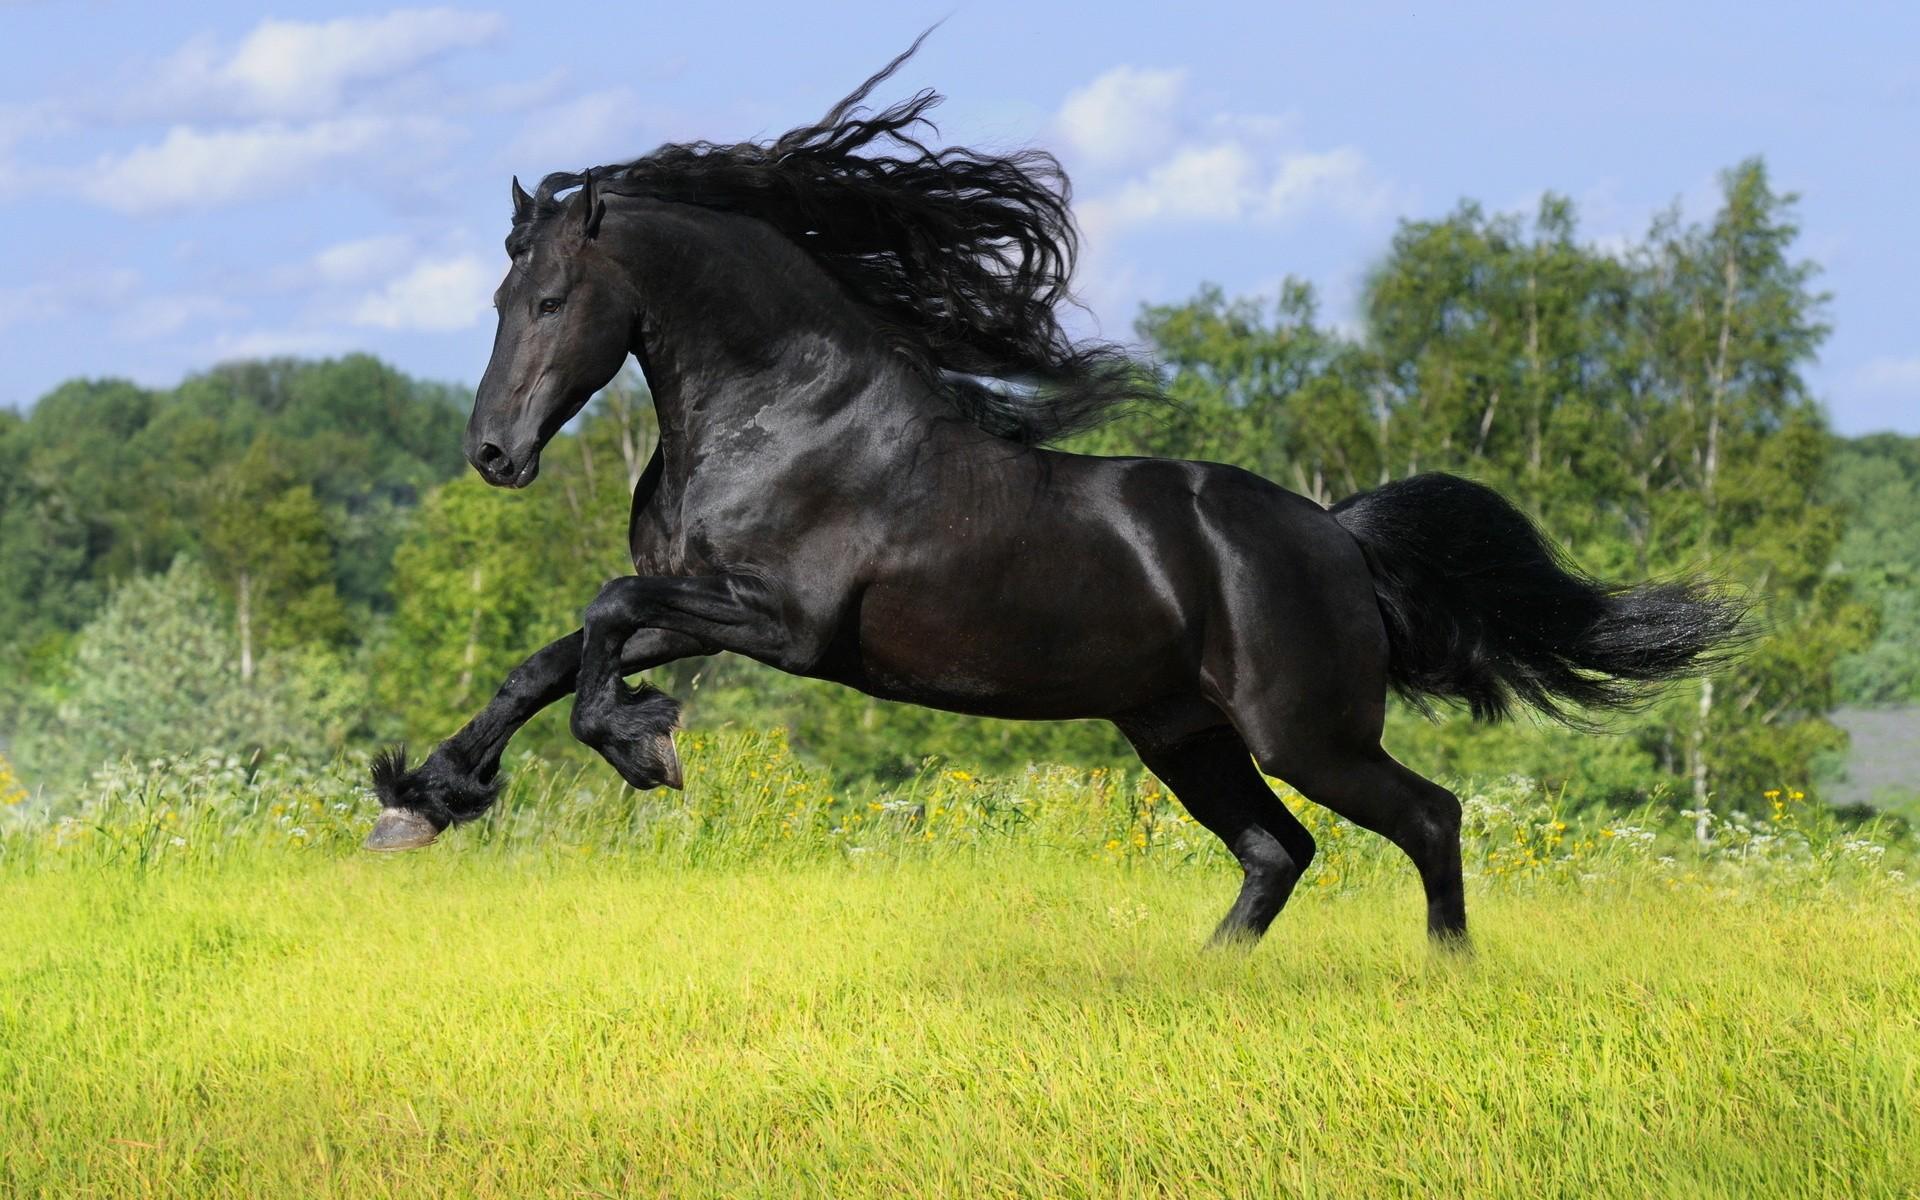 Ver fotos de caballos de mar 27